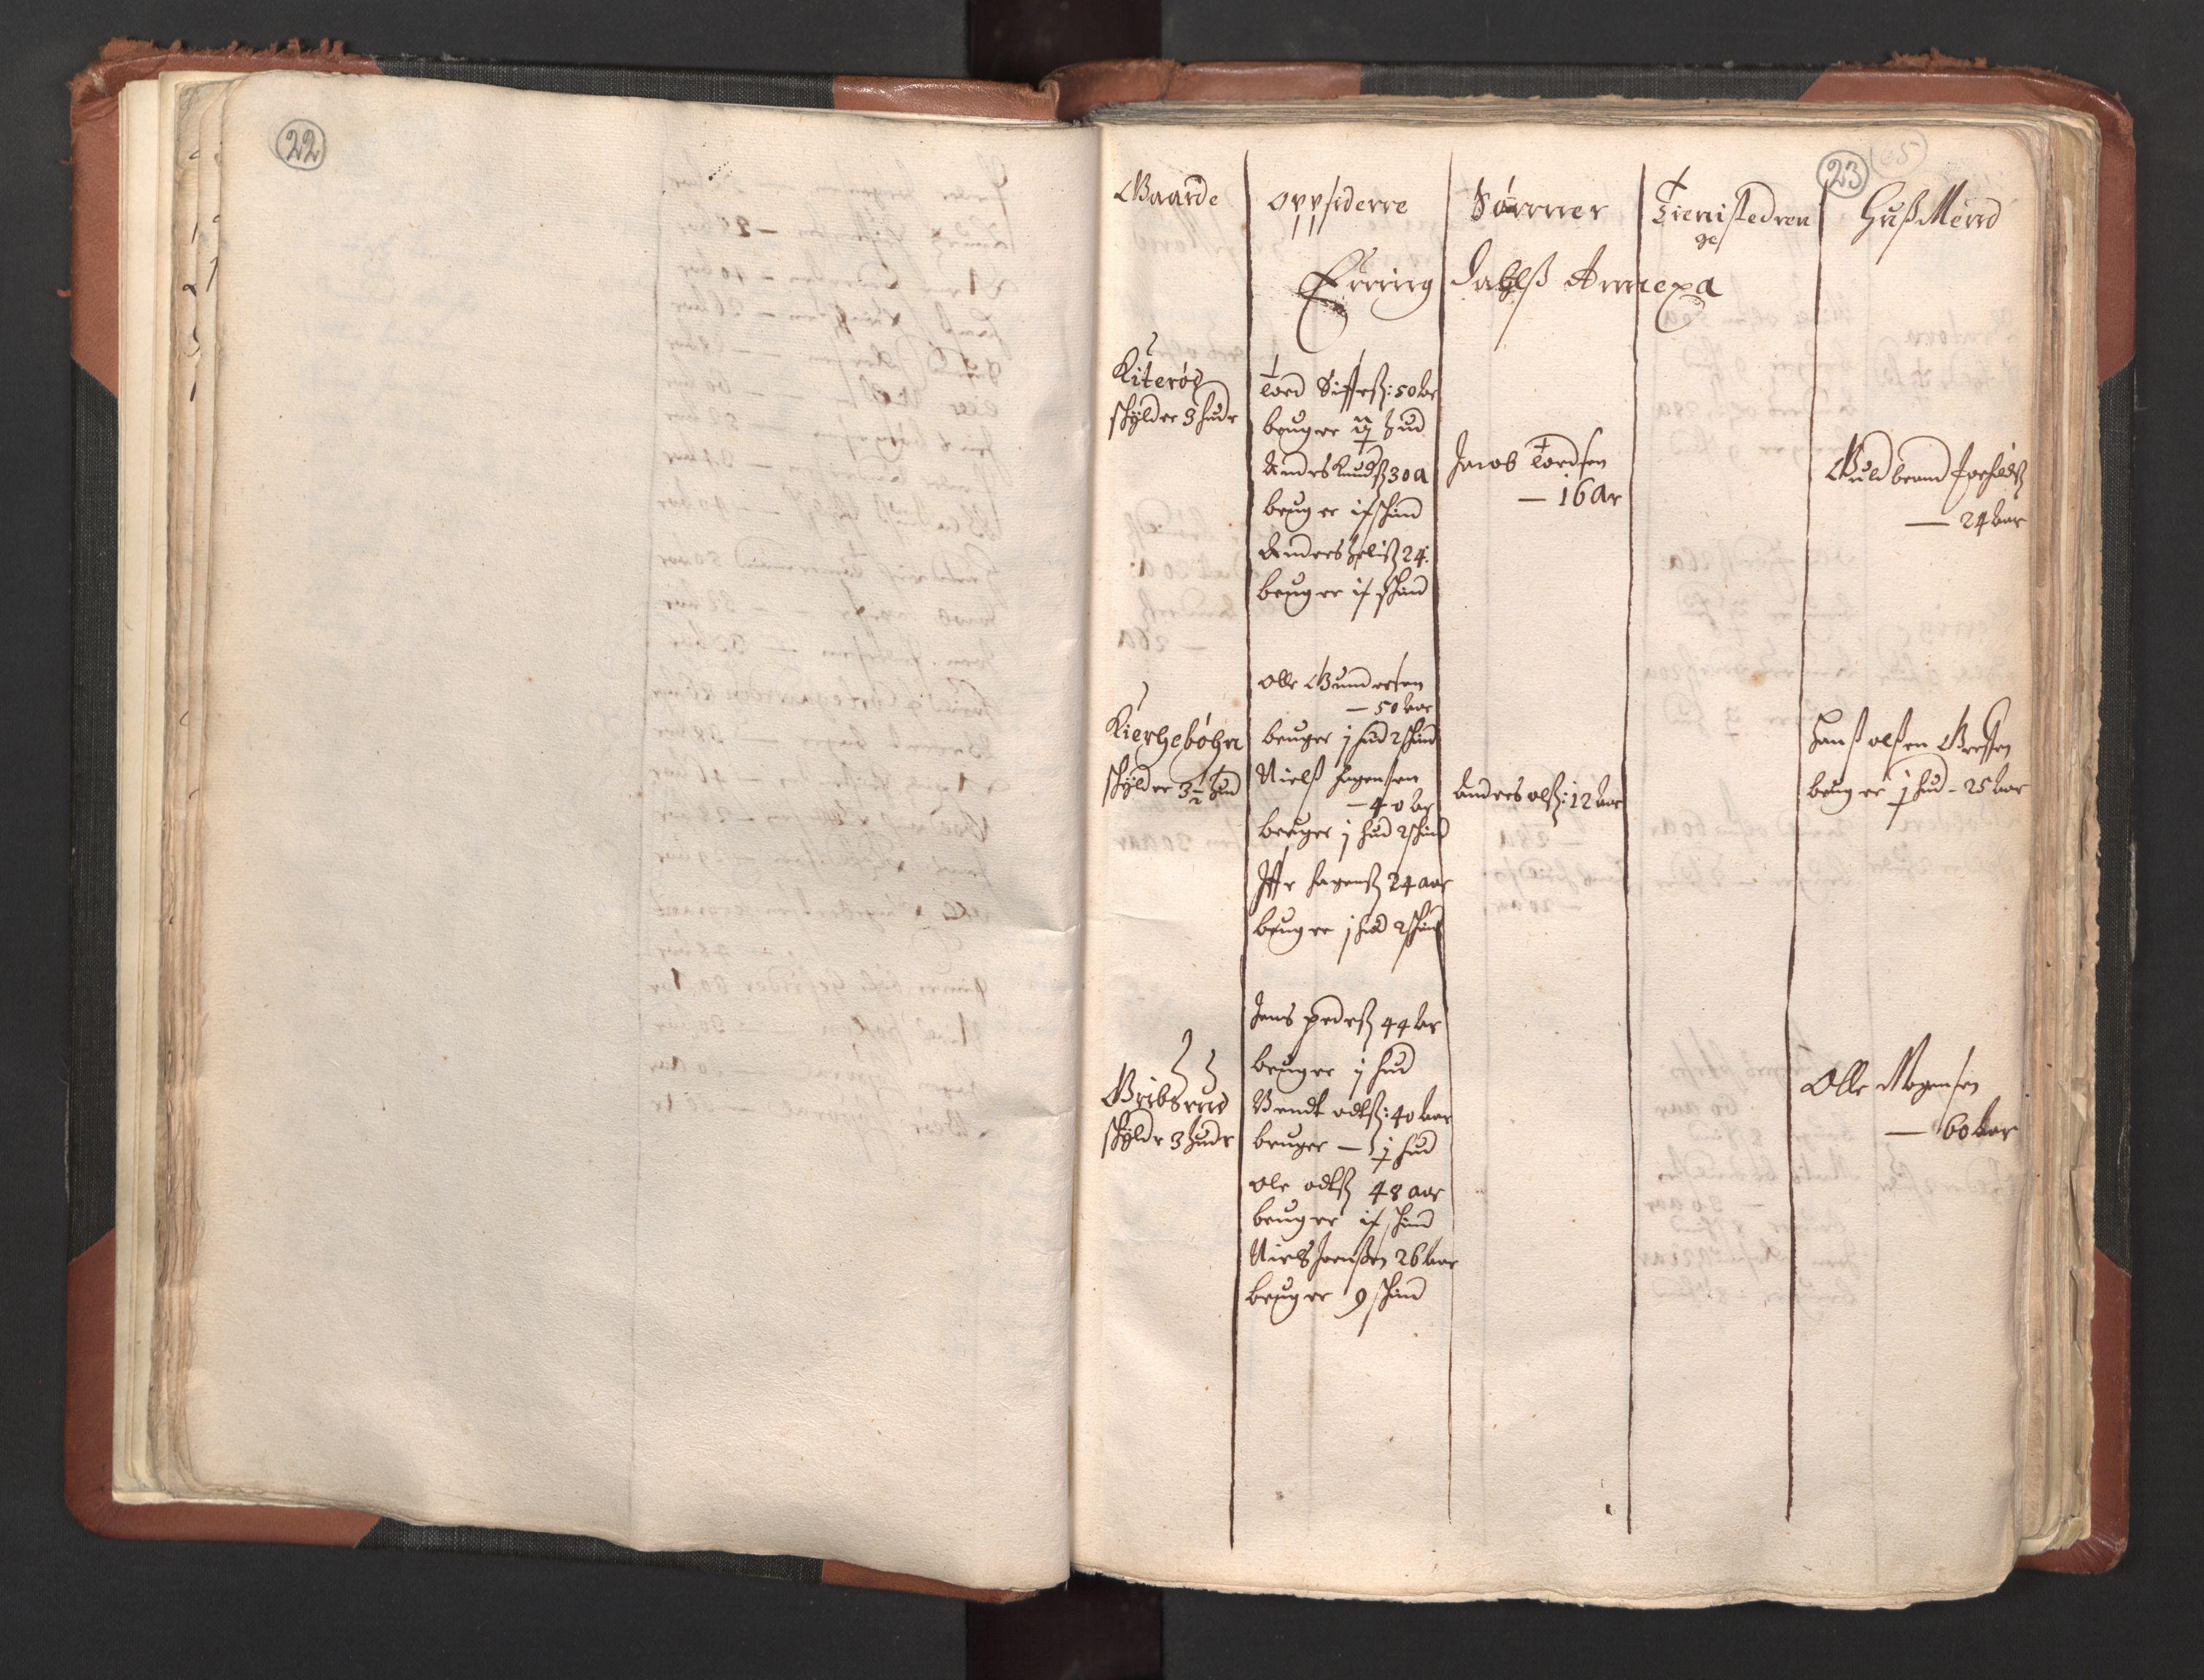 RA, Fogdenes og sorenskrivernes manntall 1664-1666, nr. 1: Fogderier (len og skipreider) i nåværende Østfold fylke, 1664, s. 22-23